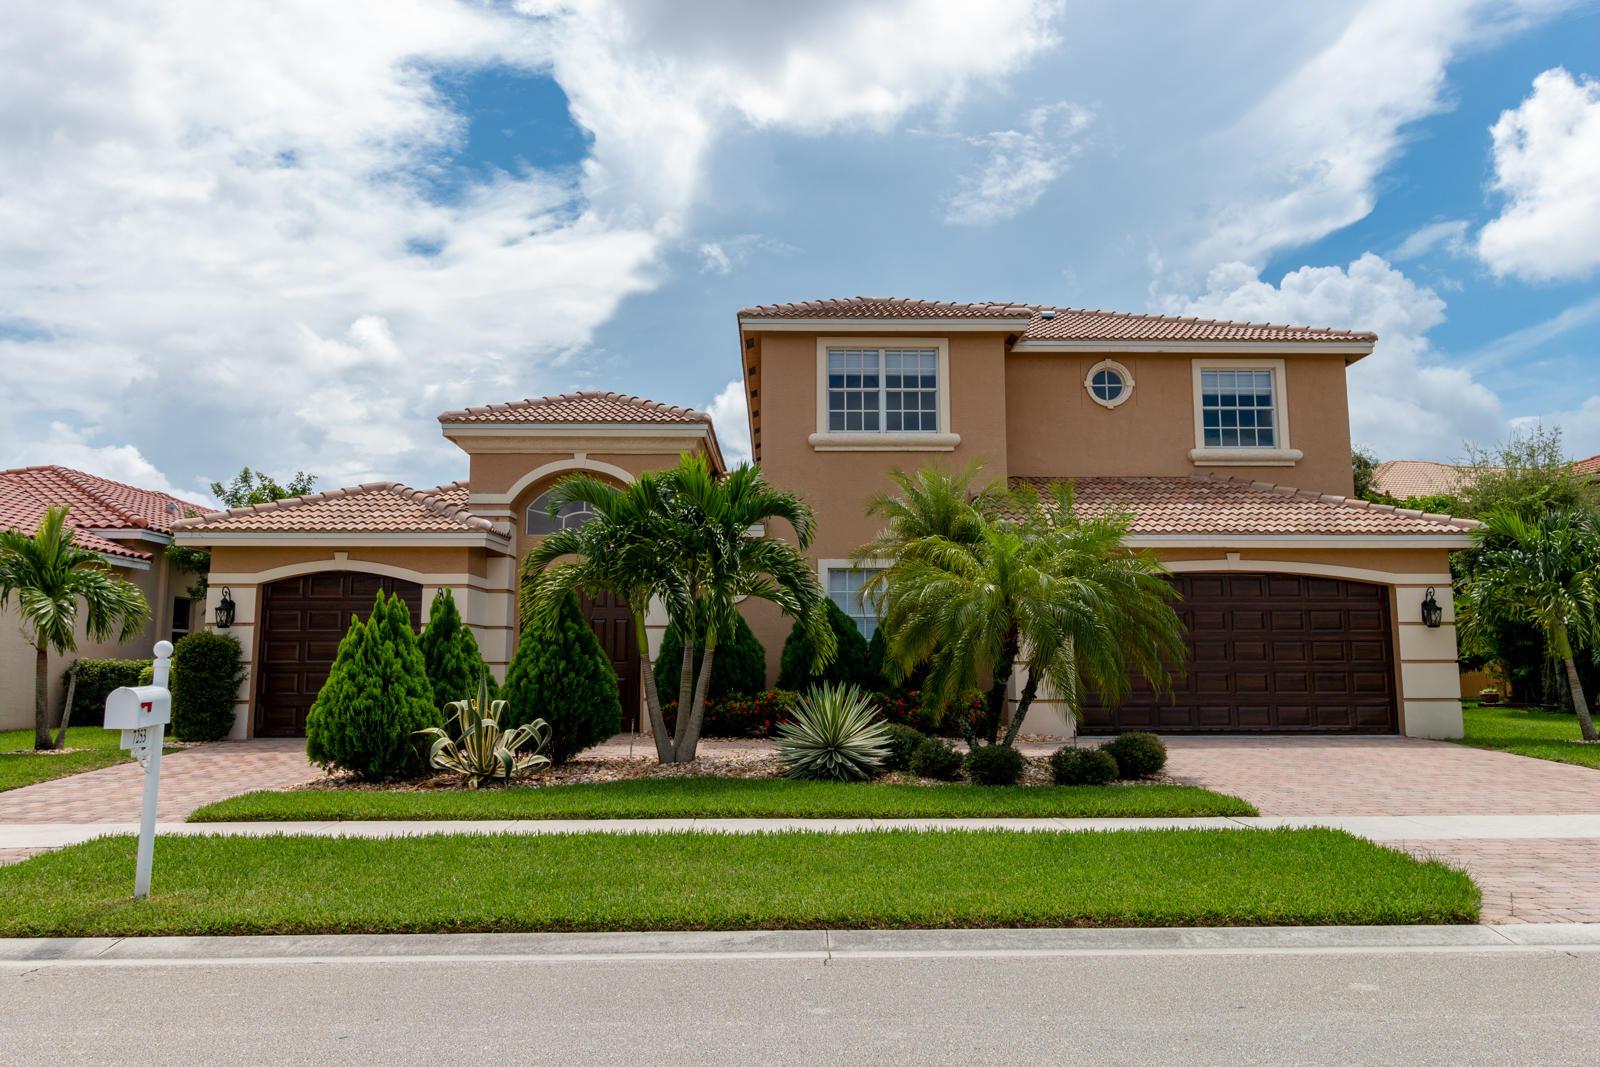 7253 Via Abruzzi, Lake Worth, Florida 33467, 6 Bedrooms Bedrooms, ,4.1 BathroomsBathrooms,Single family detached,For sale,Via Abruzzi,RX-10639093